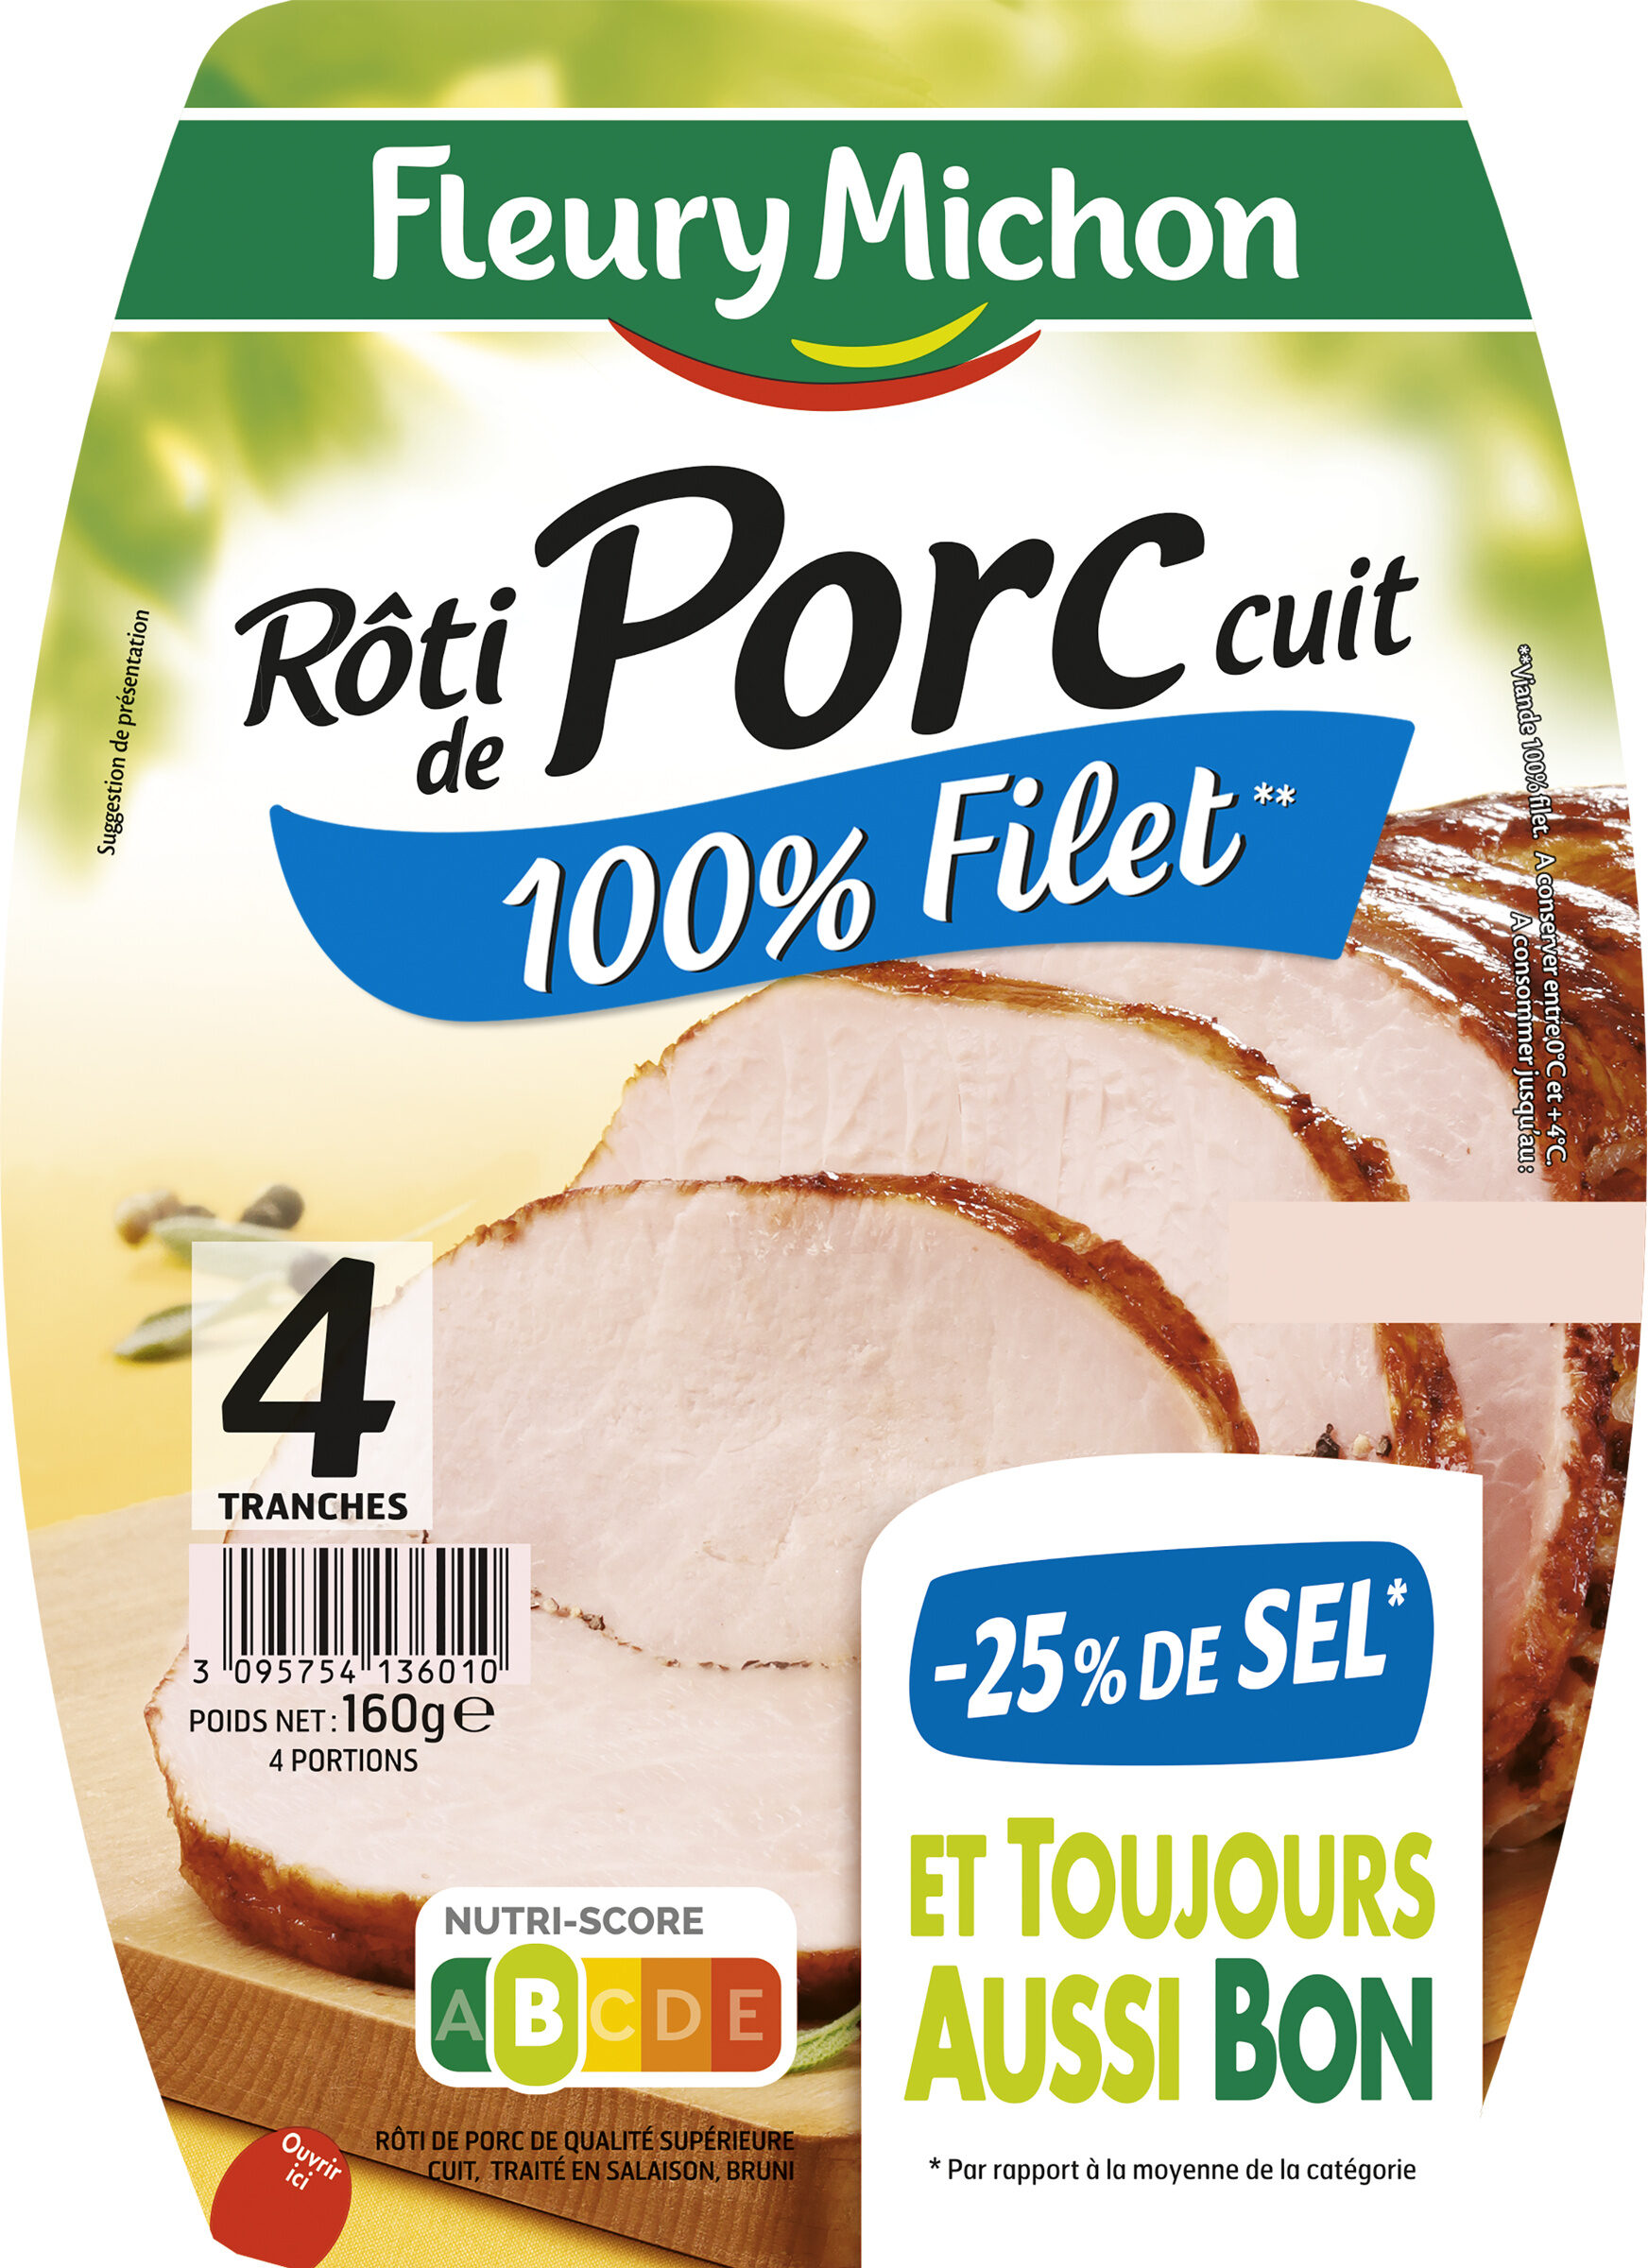 Rôti de porc cuit 100 % filet** -25% de sel* - 4 tr - Product - fr